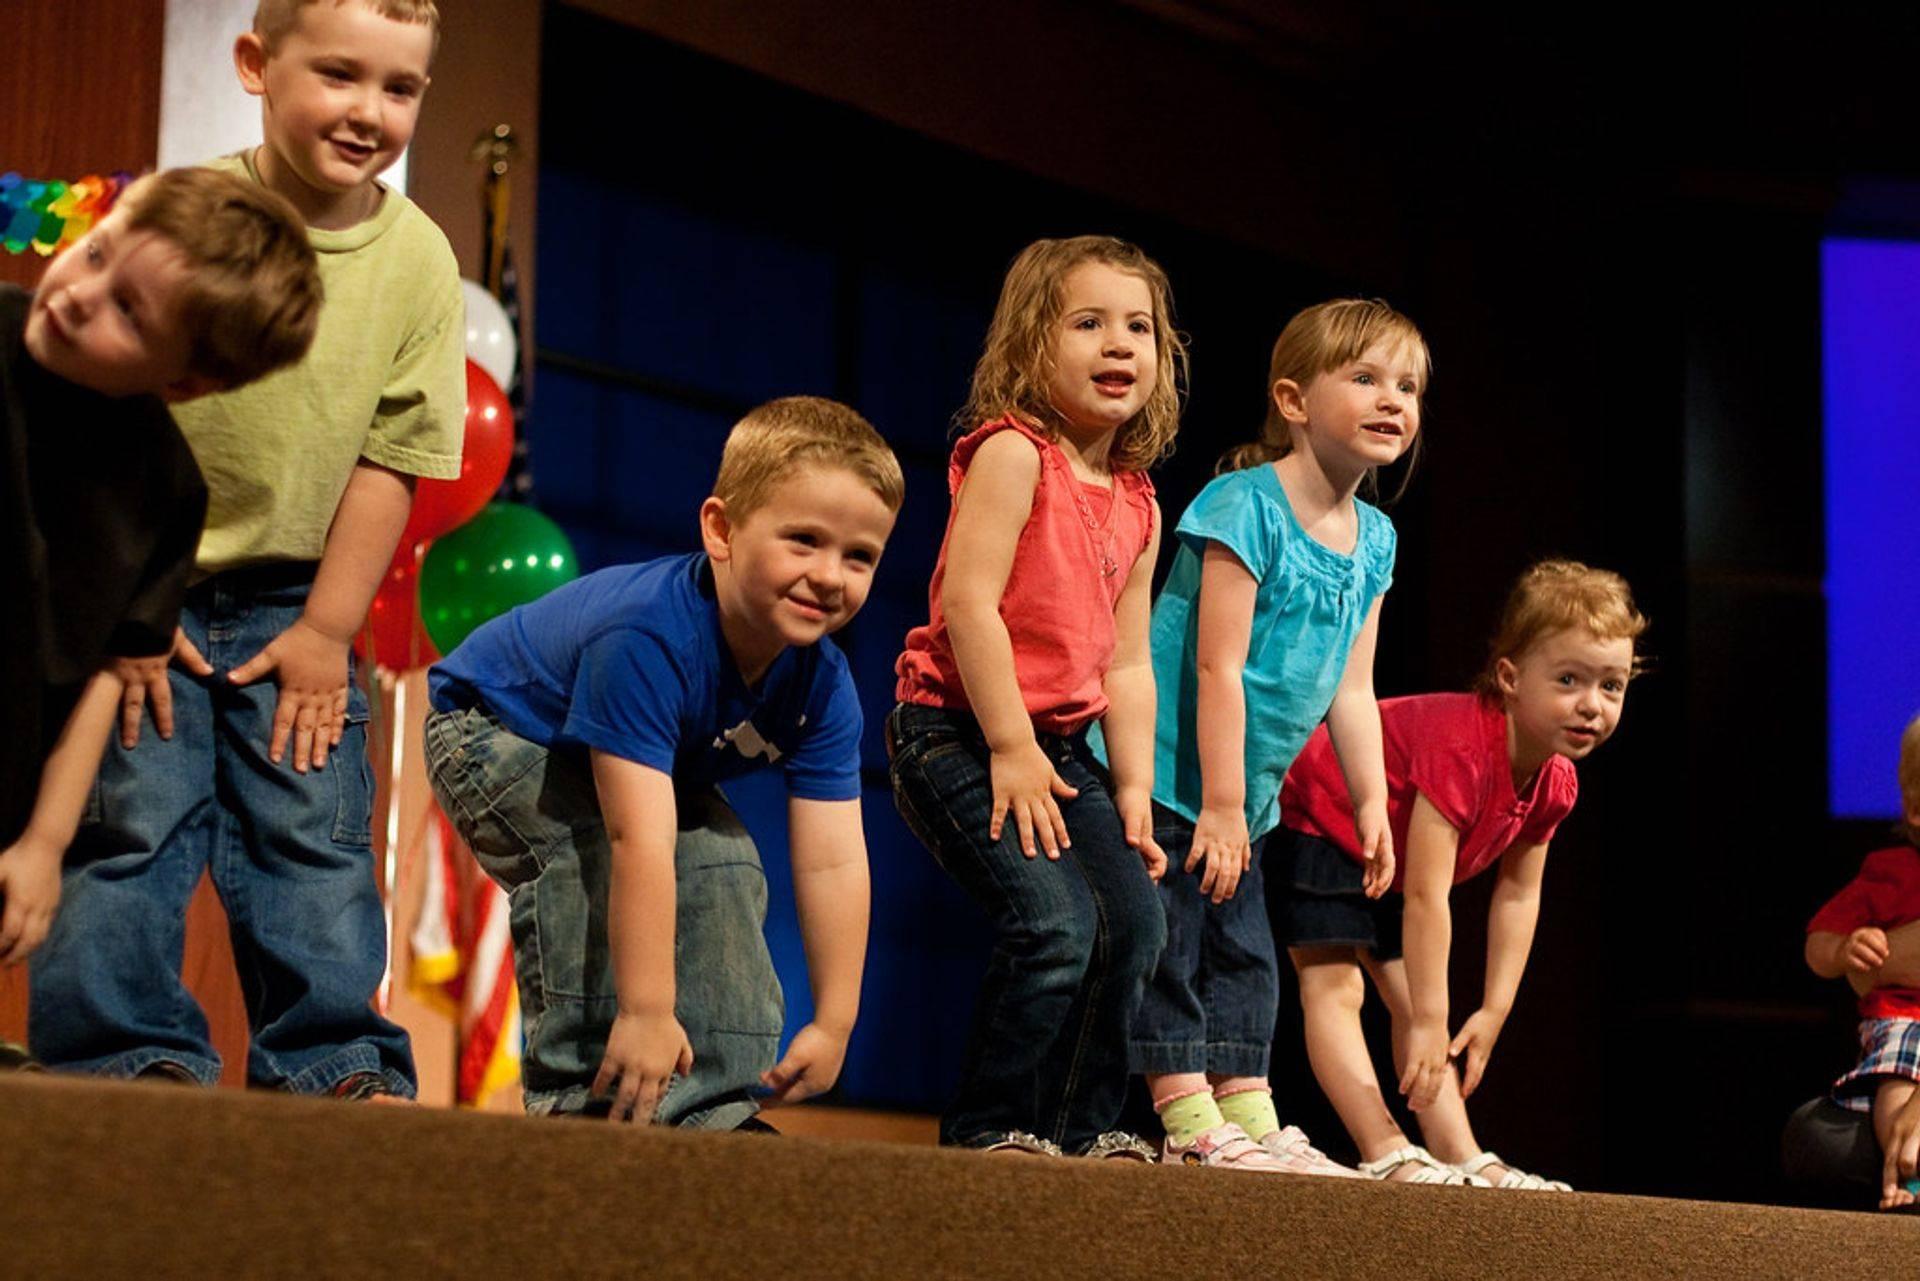 children at a program